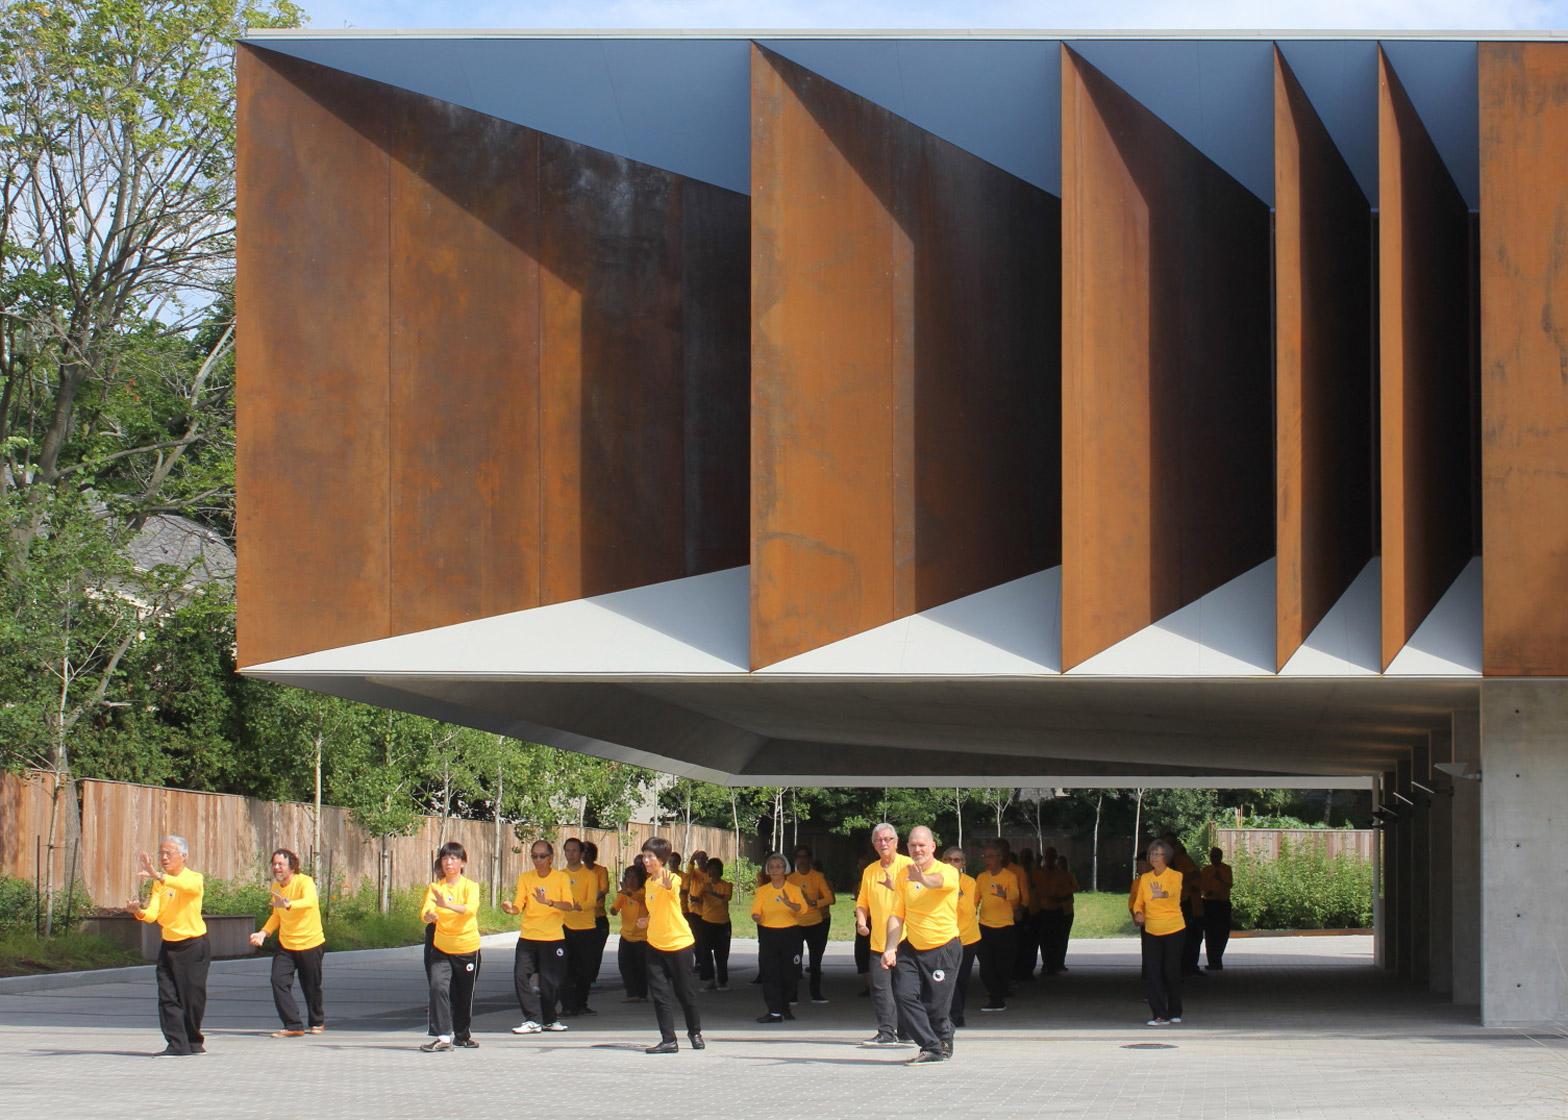 Best Architecture Under 1000 sq m - Wong Dai Sin Temple